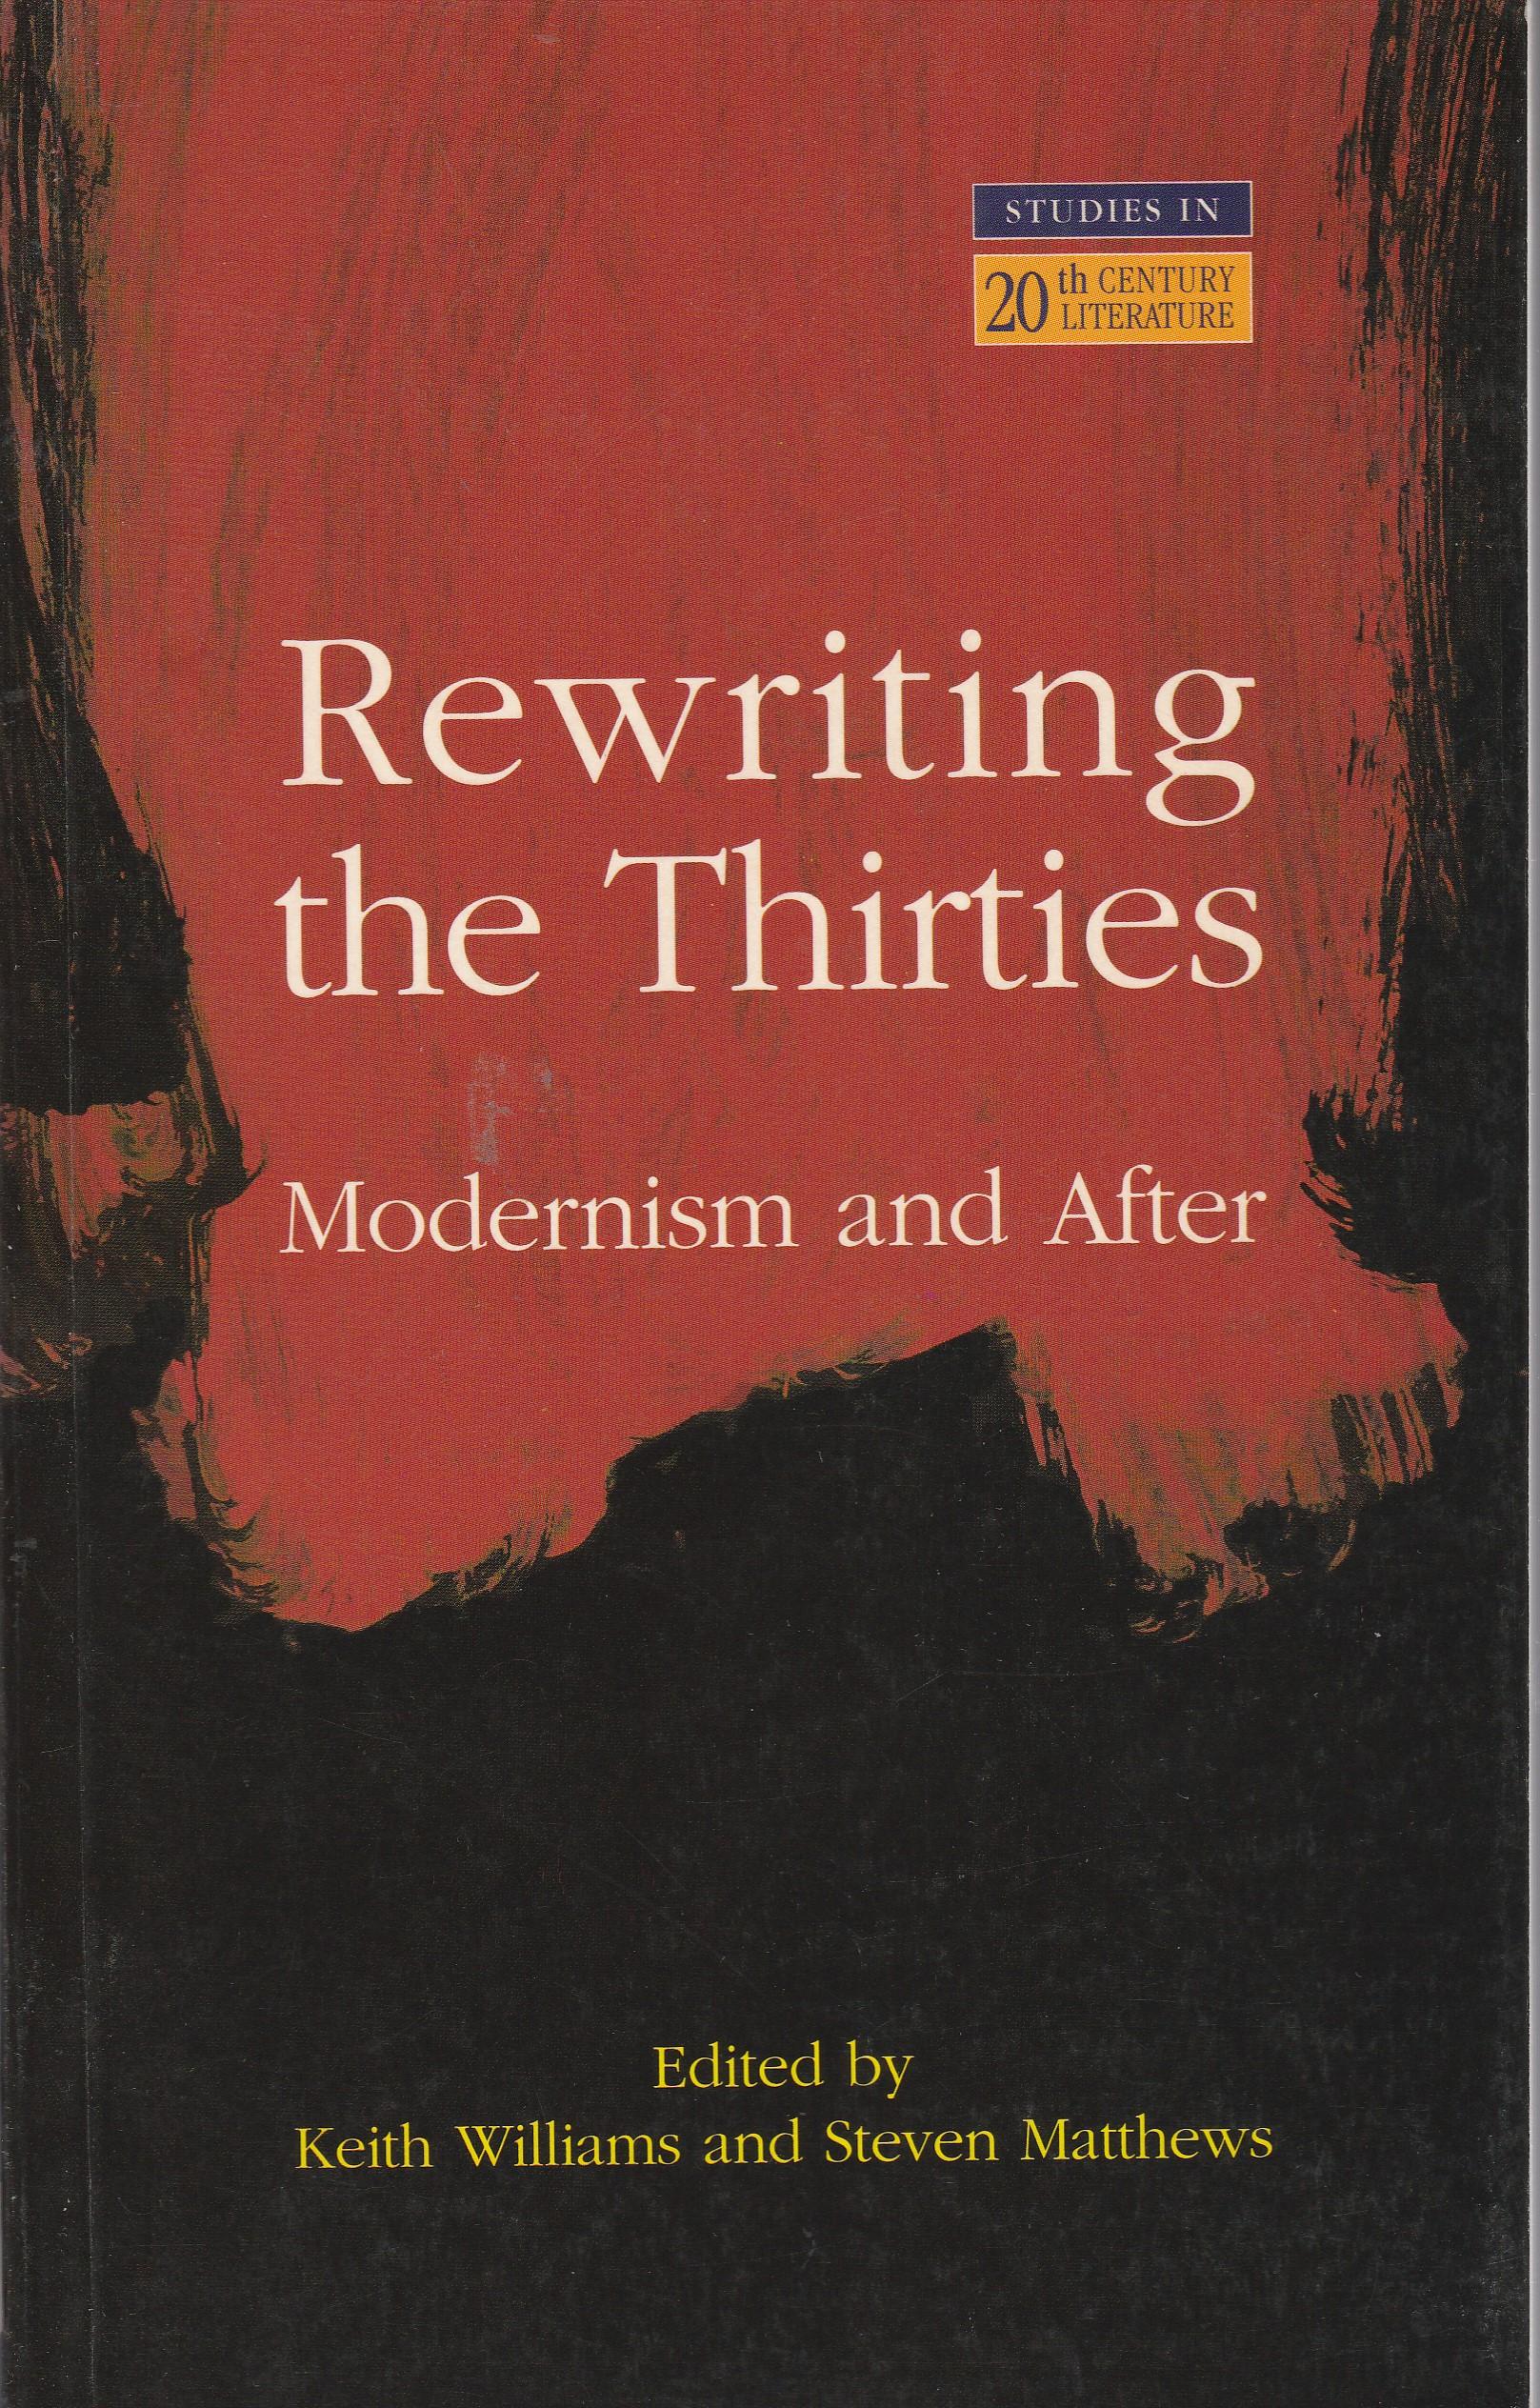 Rewriting the Thirties